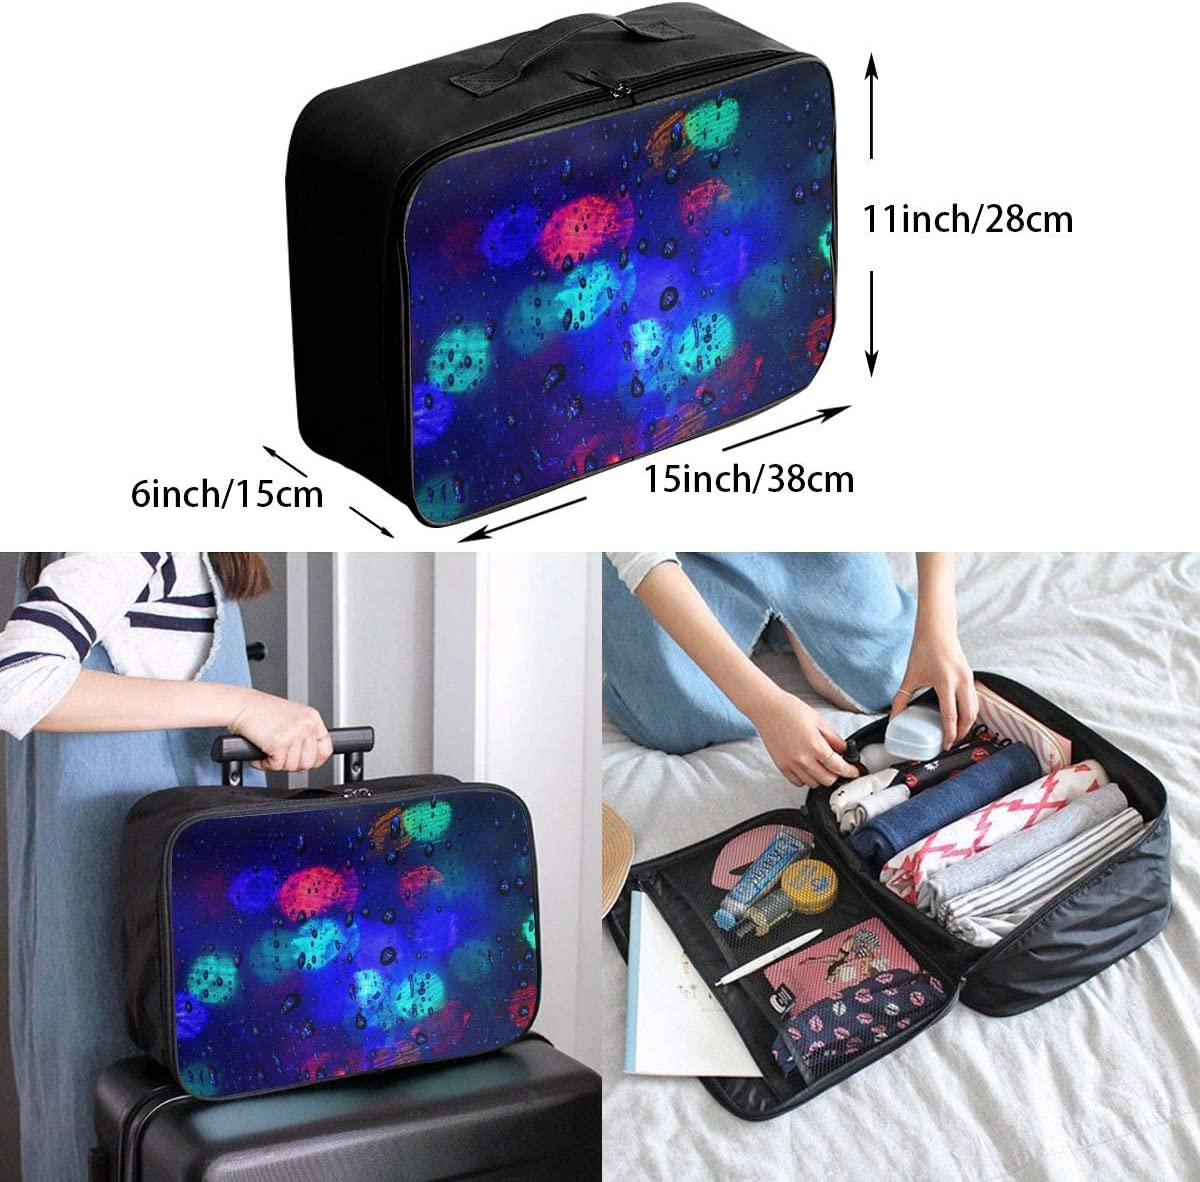 Rain-lights Travel Carry-on Luggage Weekender Bag Overnight Tote Flight Duffel In Trolley Handle